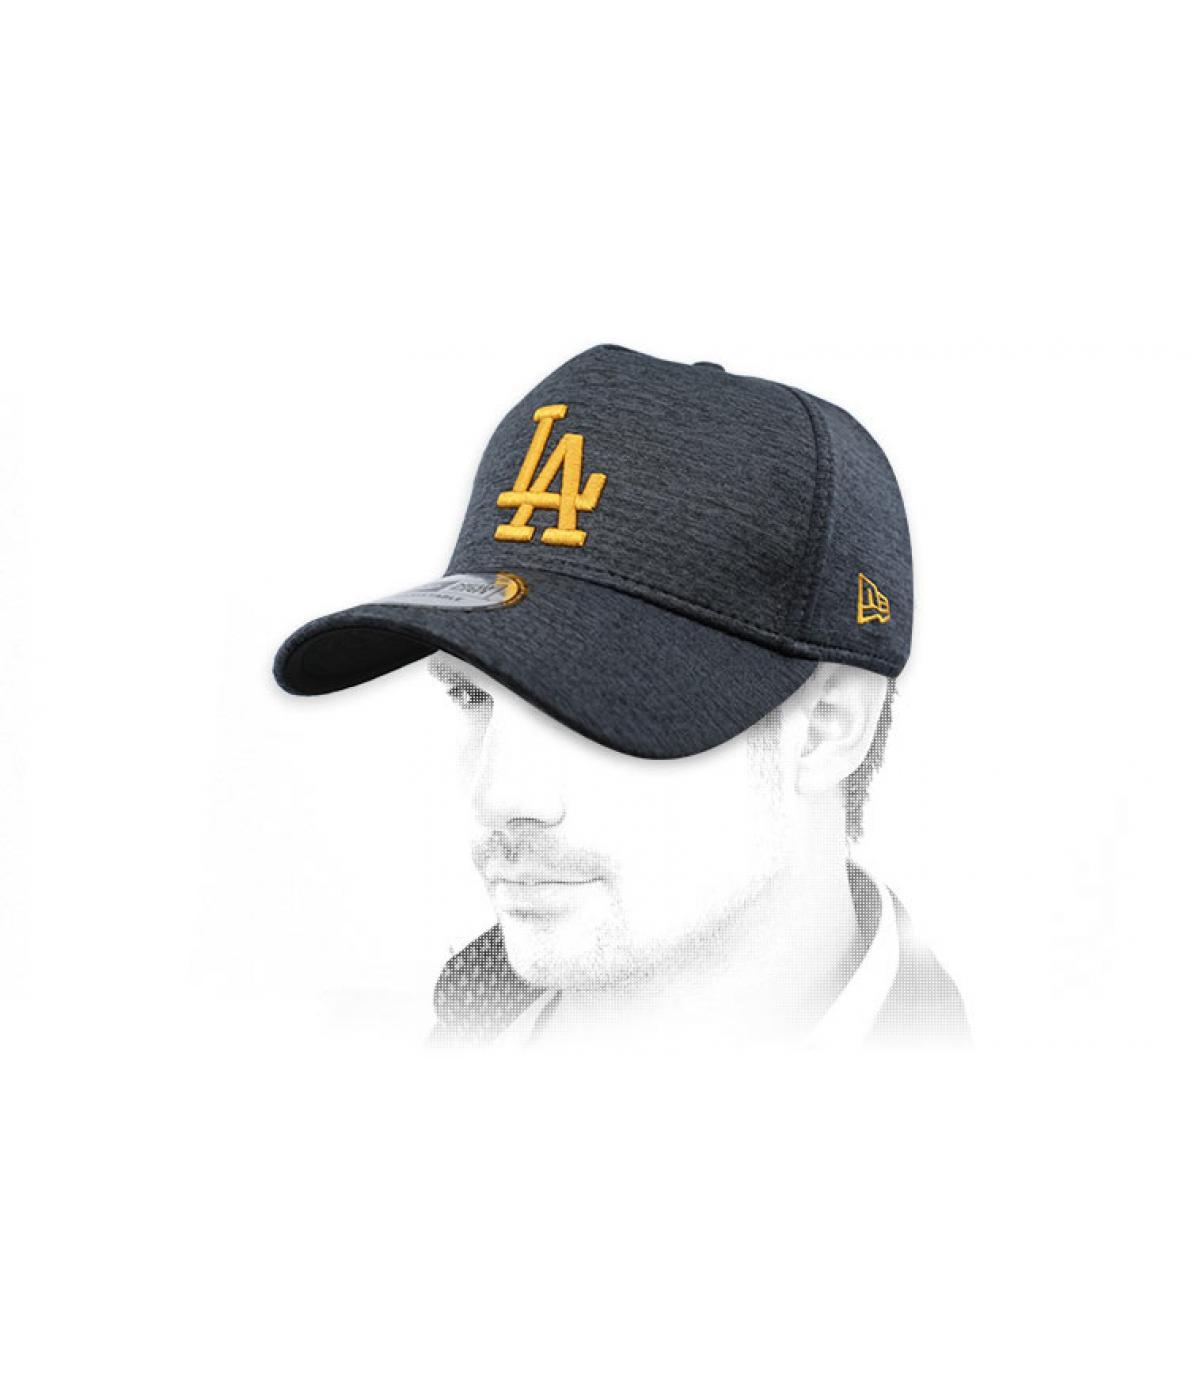 gorra LA negro amarillo